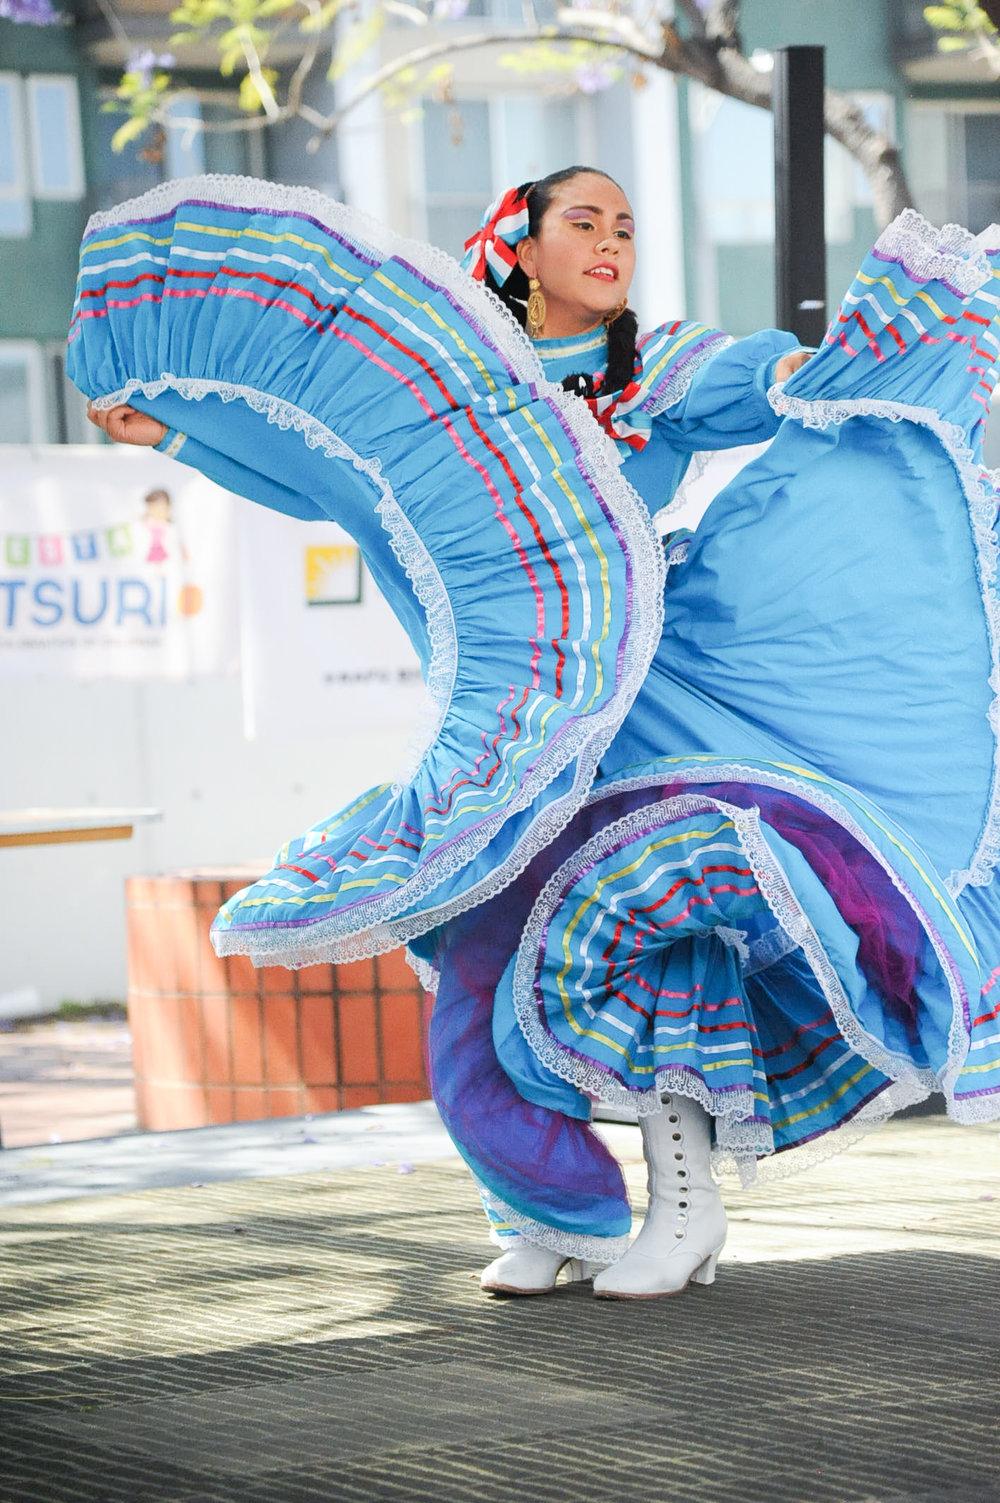 Matsuri0432.jpg